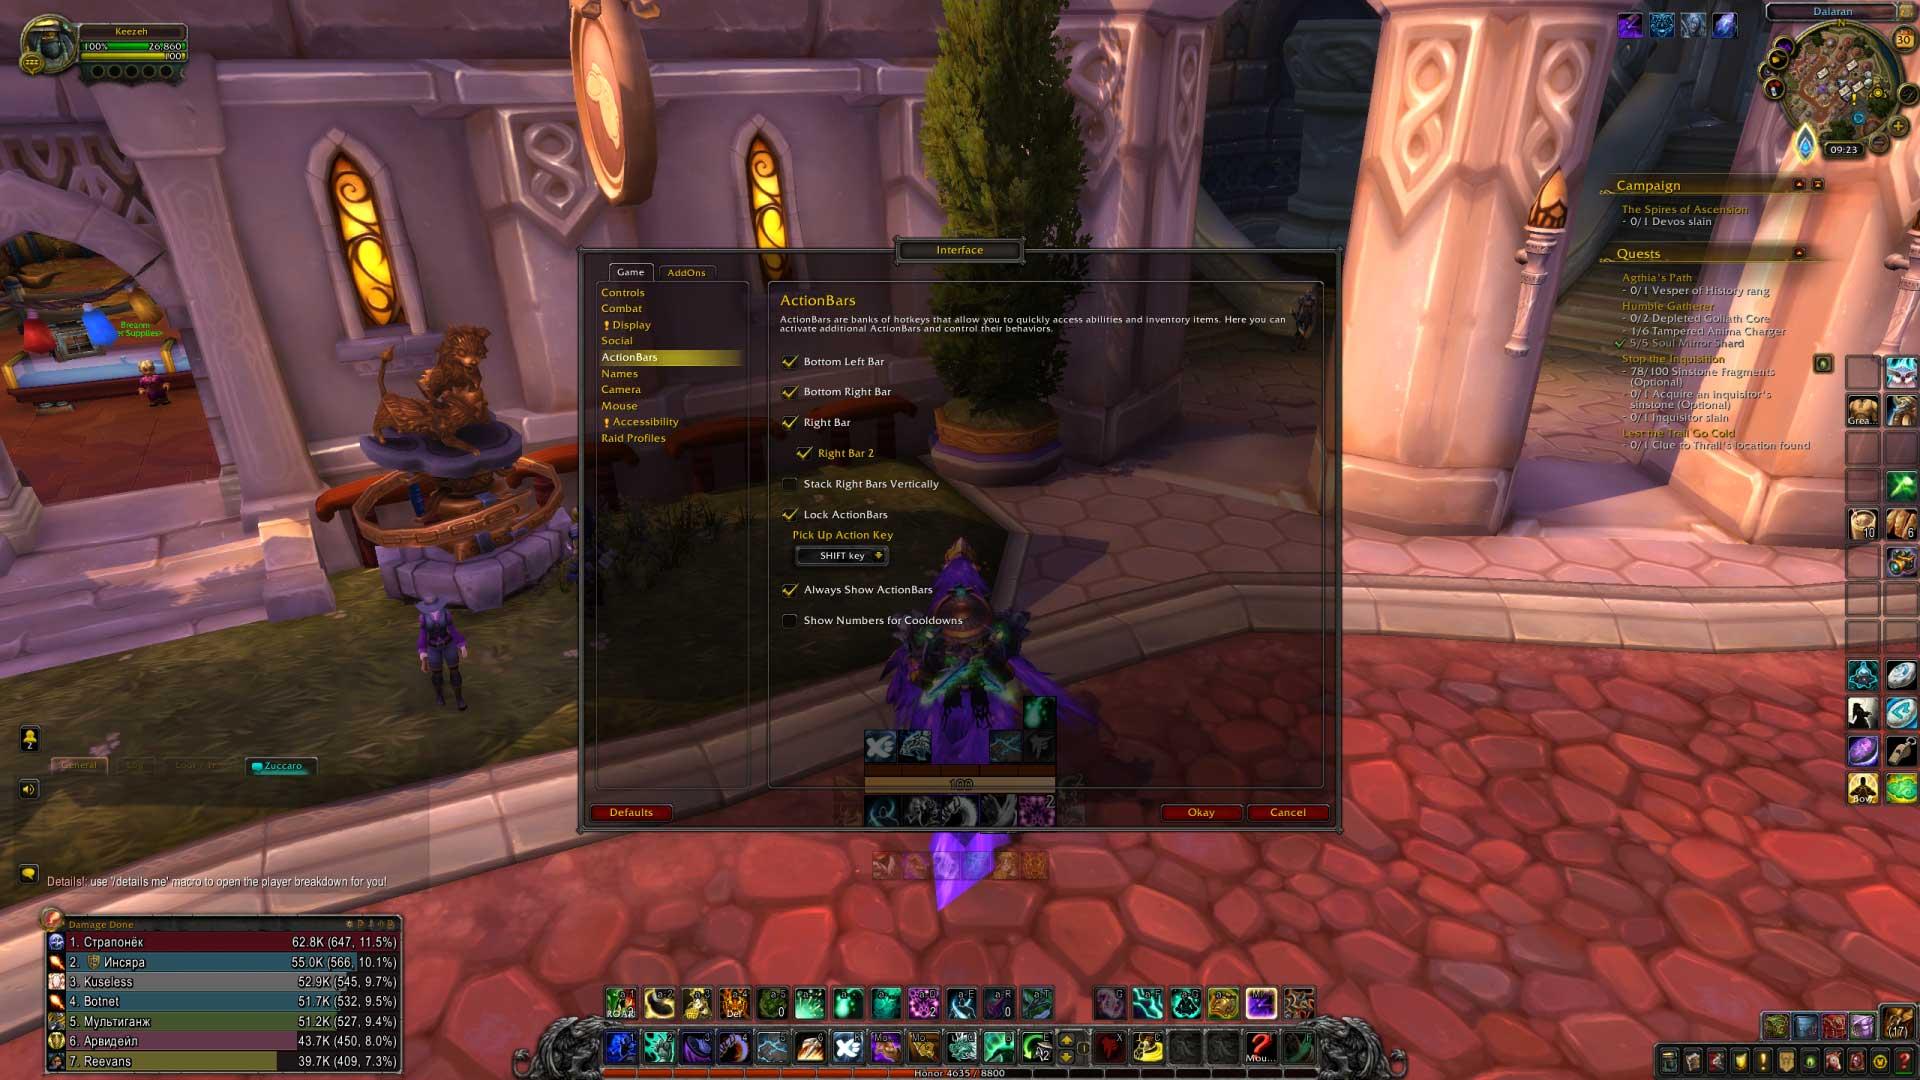 World-of-Warcraft-Ustawienia-interfejsu-3